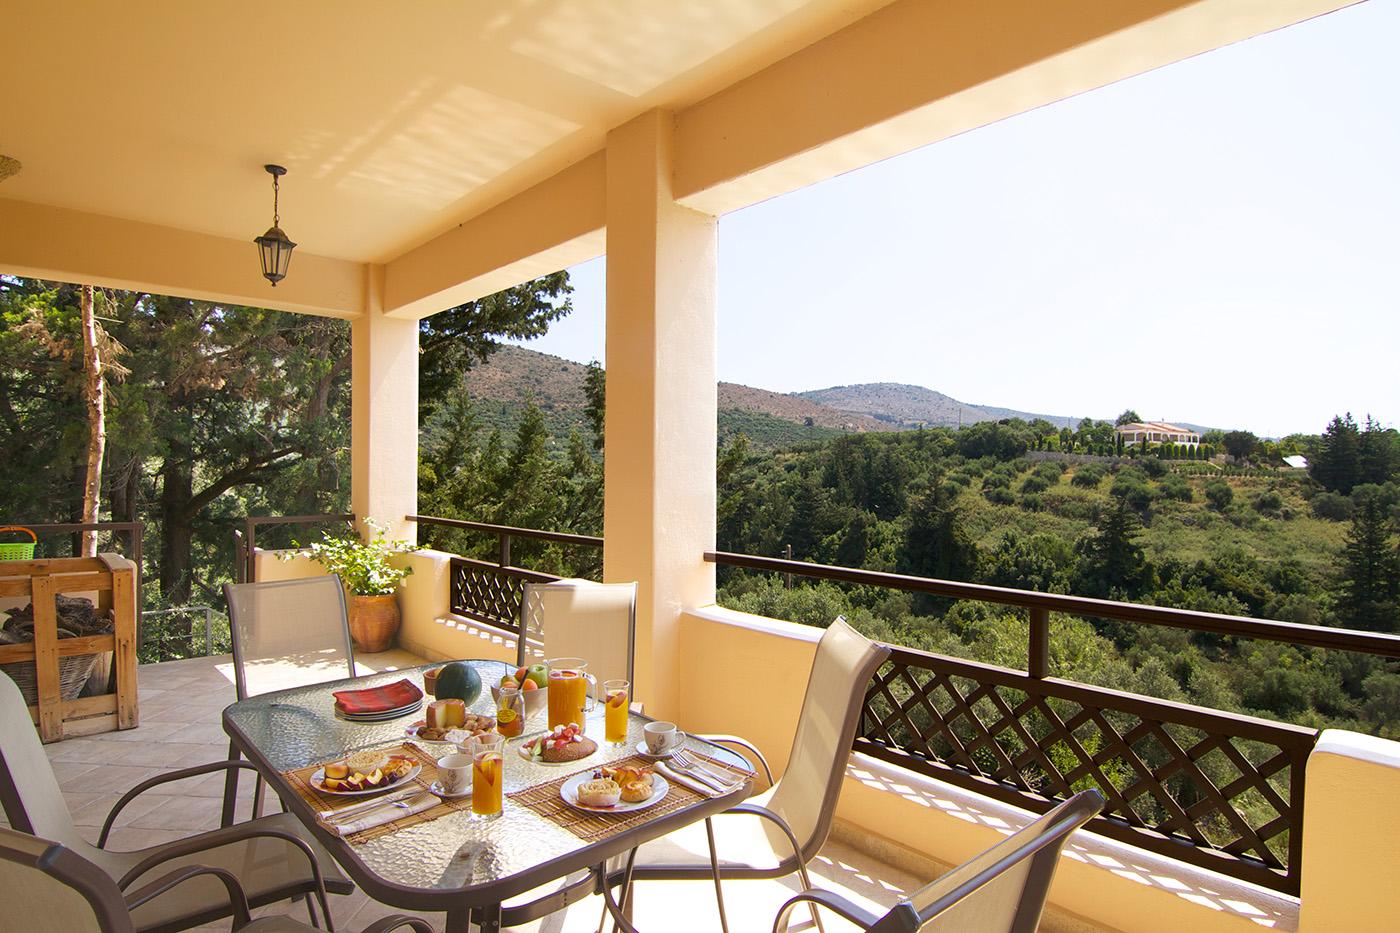 Outdoors - Veranda and sitting area